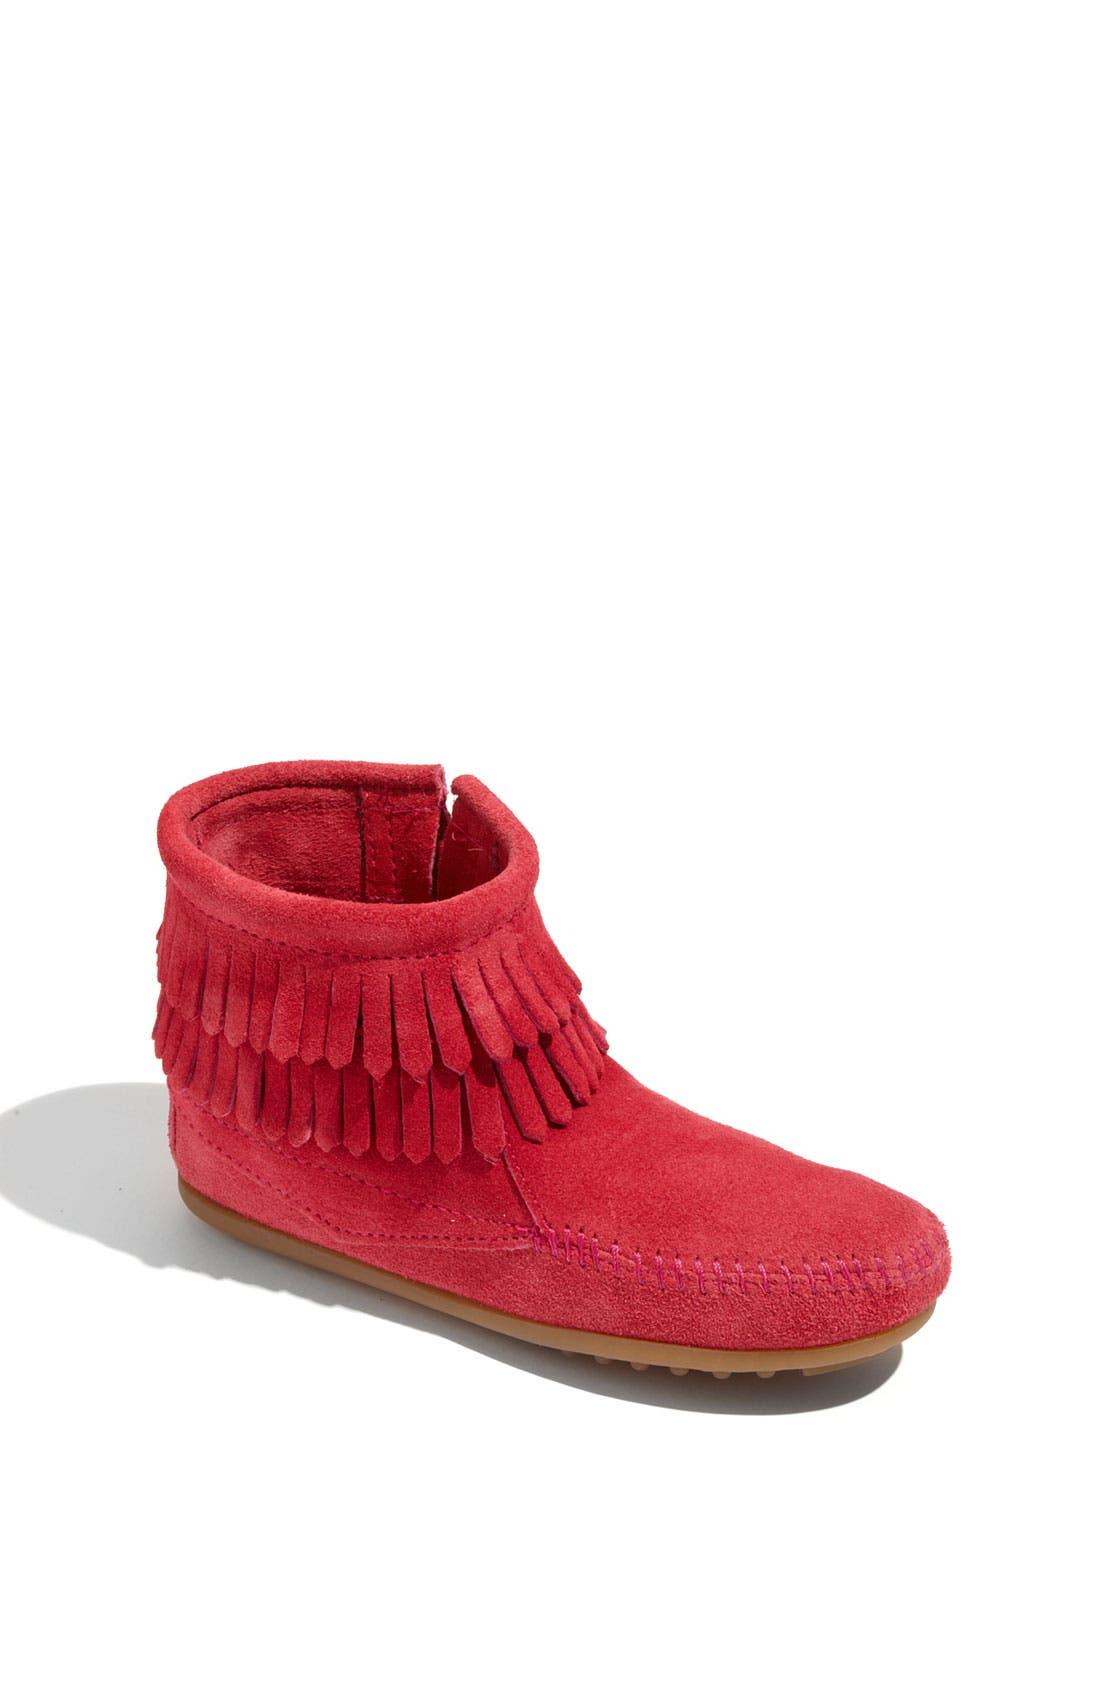 Minnetonka 'Double Fringe' Boot (Walker, Toddler, Little Kid & Big Kid)